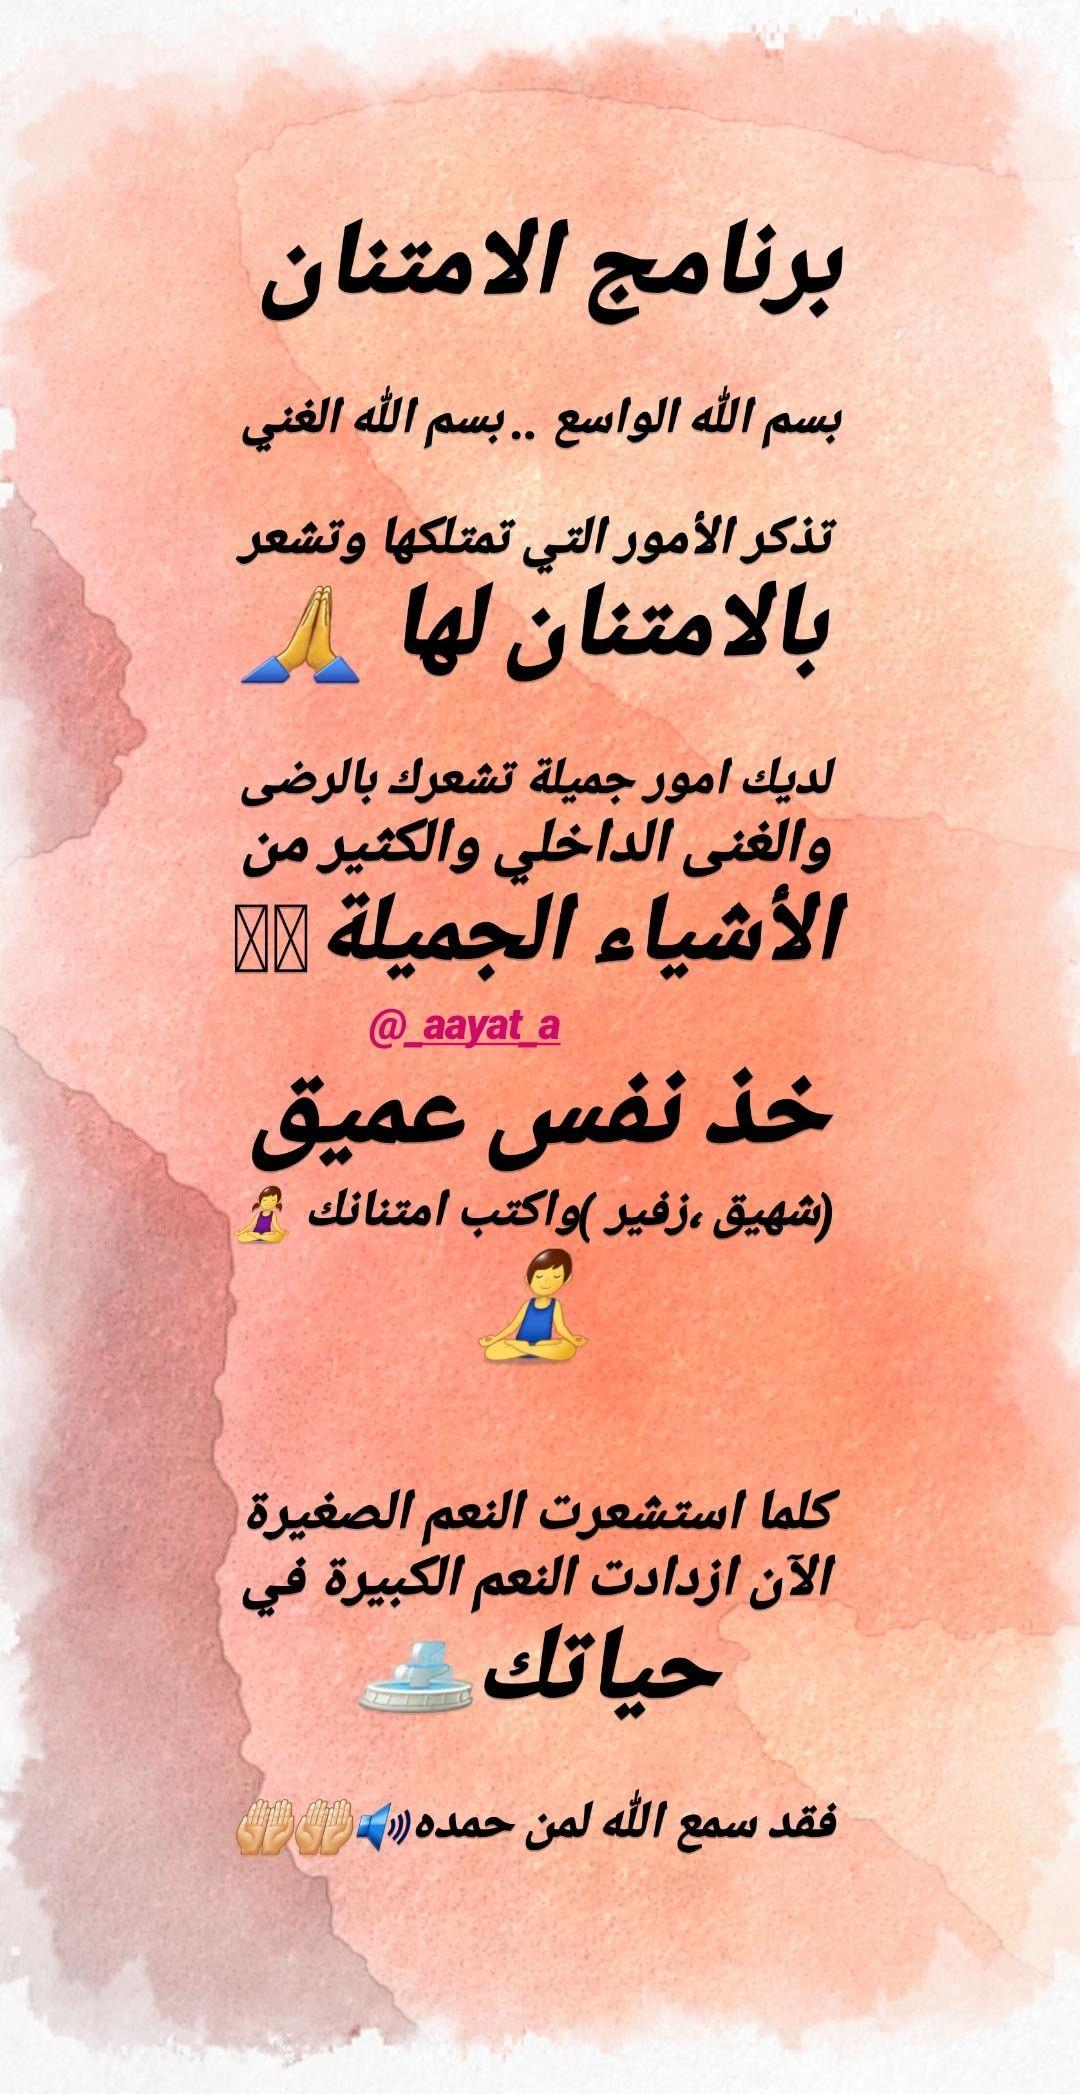 برنامج الامتنان Quotes For Book Lovers Powerful Quotes Islamic Phrases